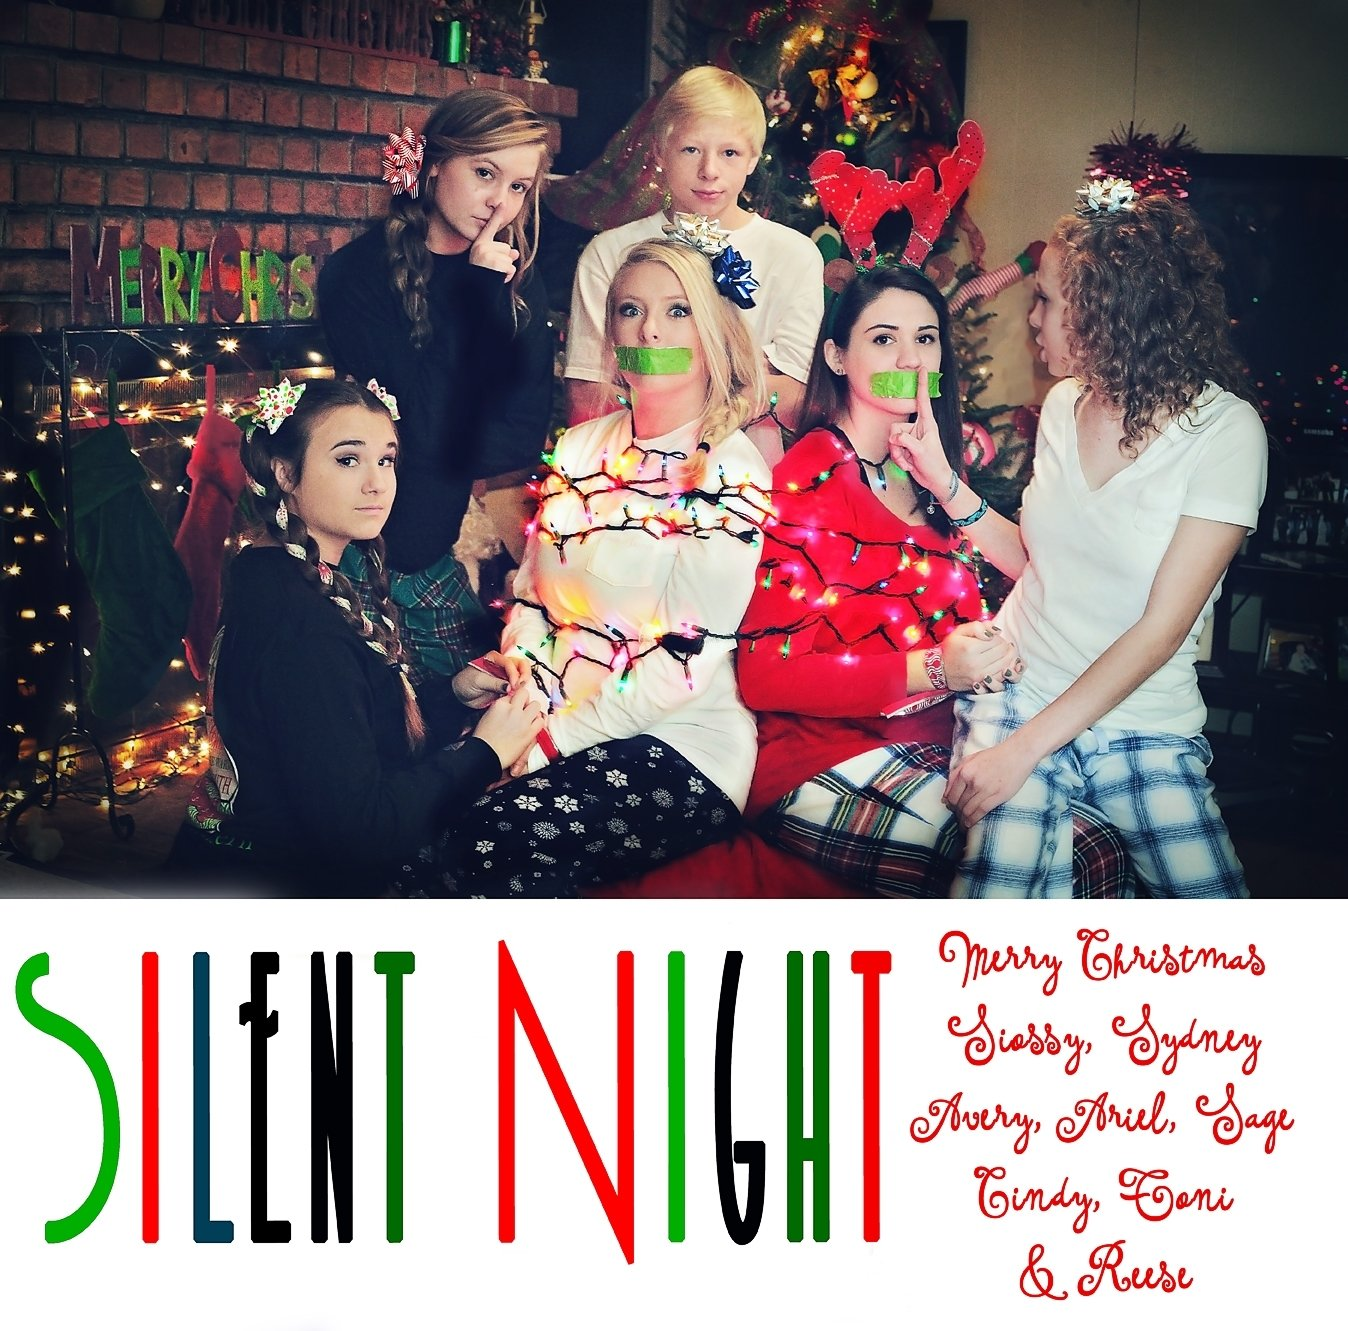 10 Fabulous Unique Family Christmas Photo Ideas fun family christmas card cynthiajillphoto conyers ga silent